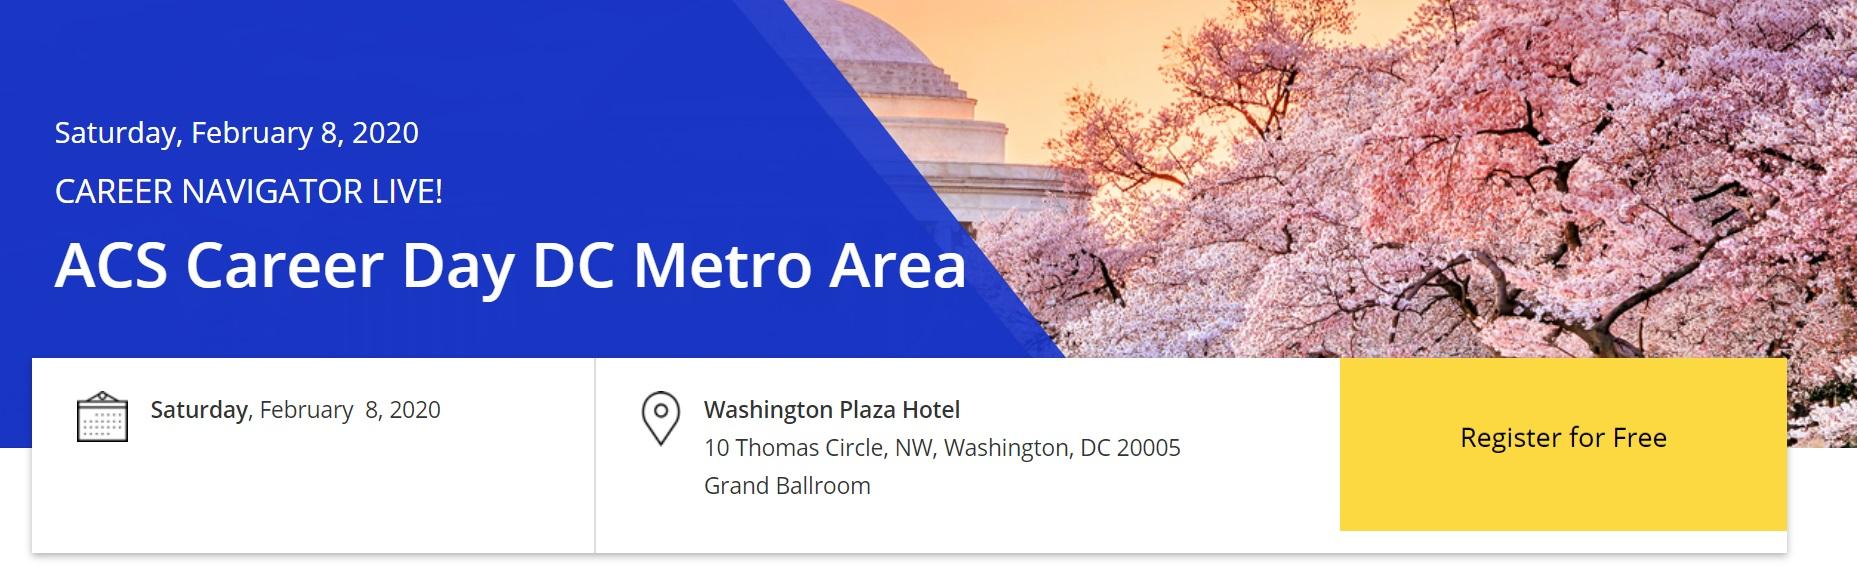 ACS Career Day DC Metro Area